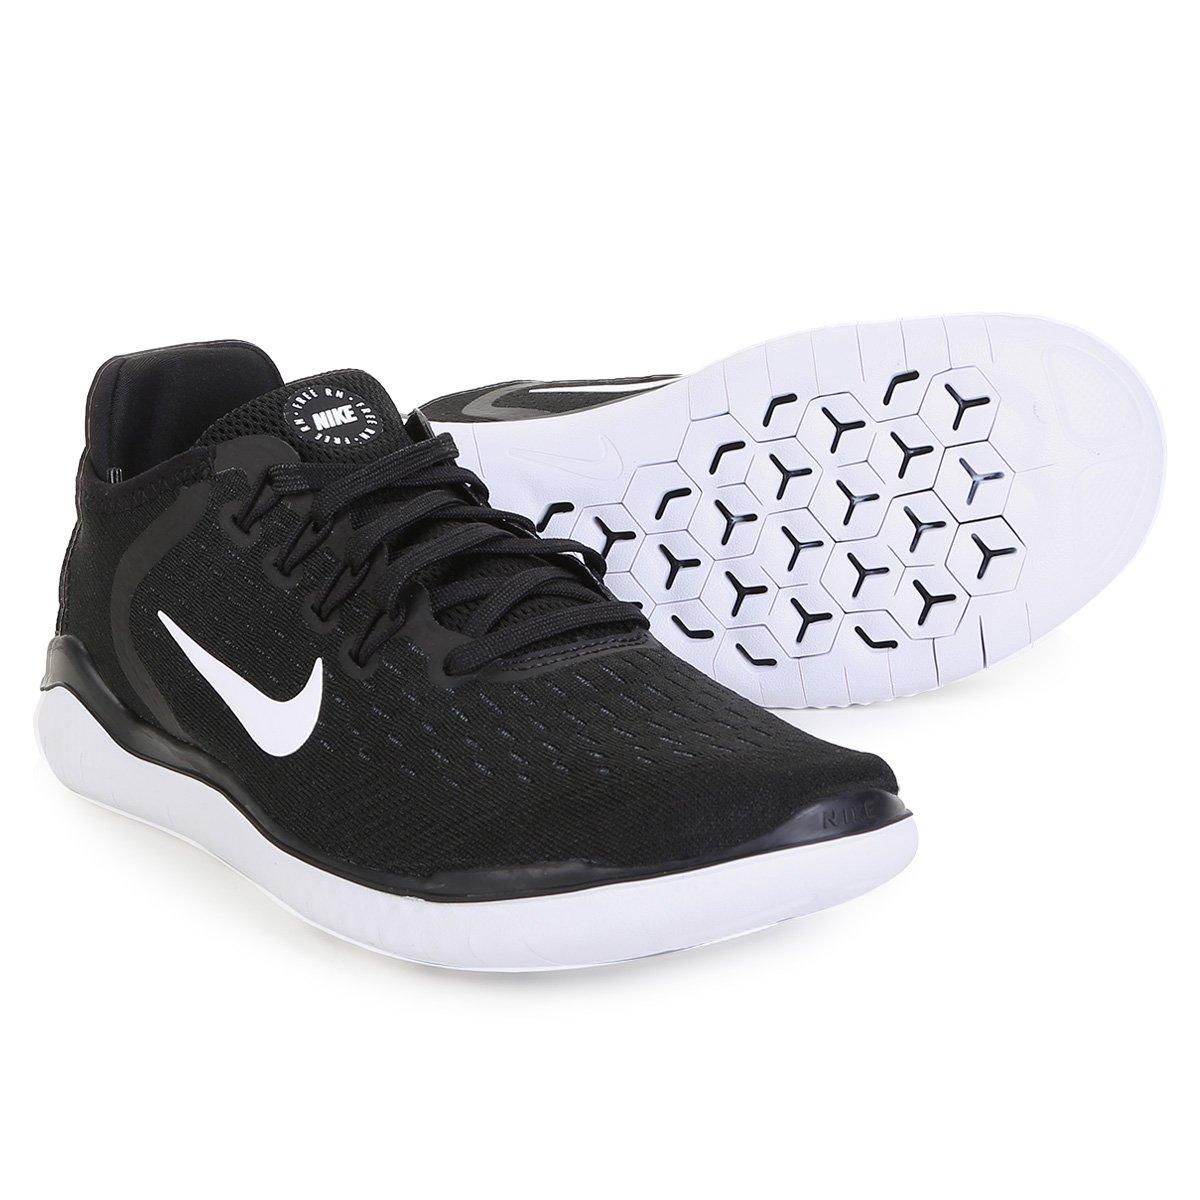 Tênis Nike Free Rn 2018 Feminino Allianz Parque Shop